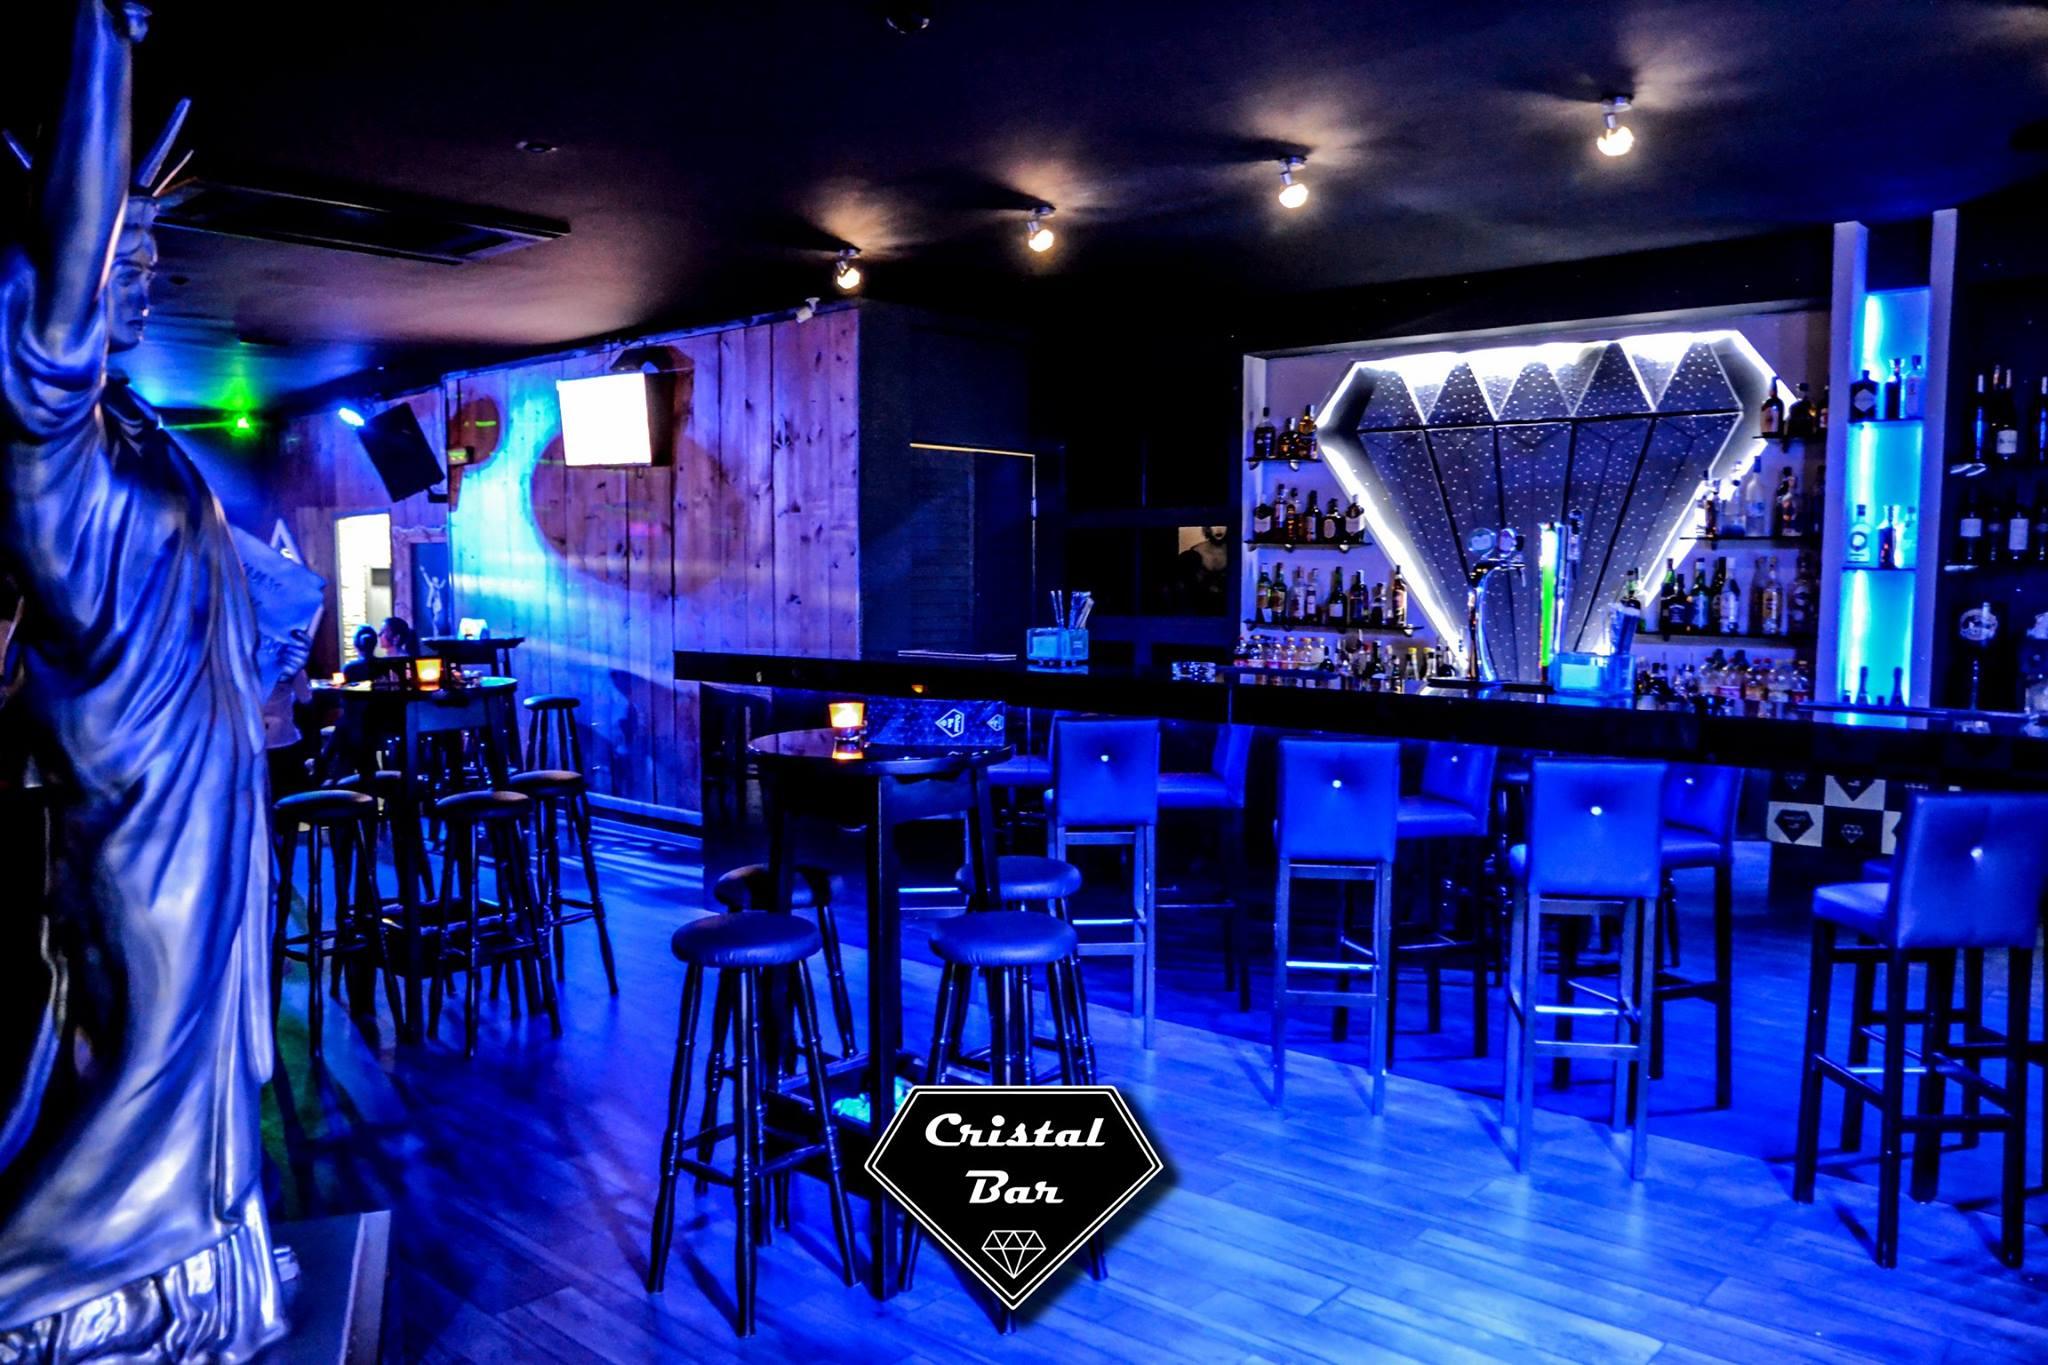 Cristal Bar